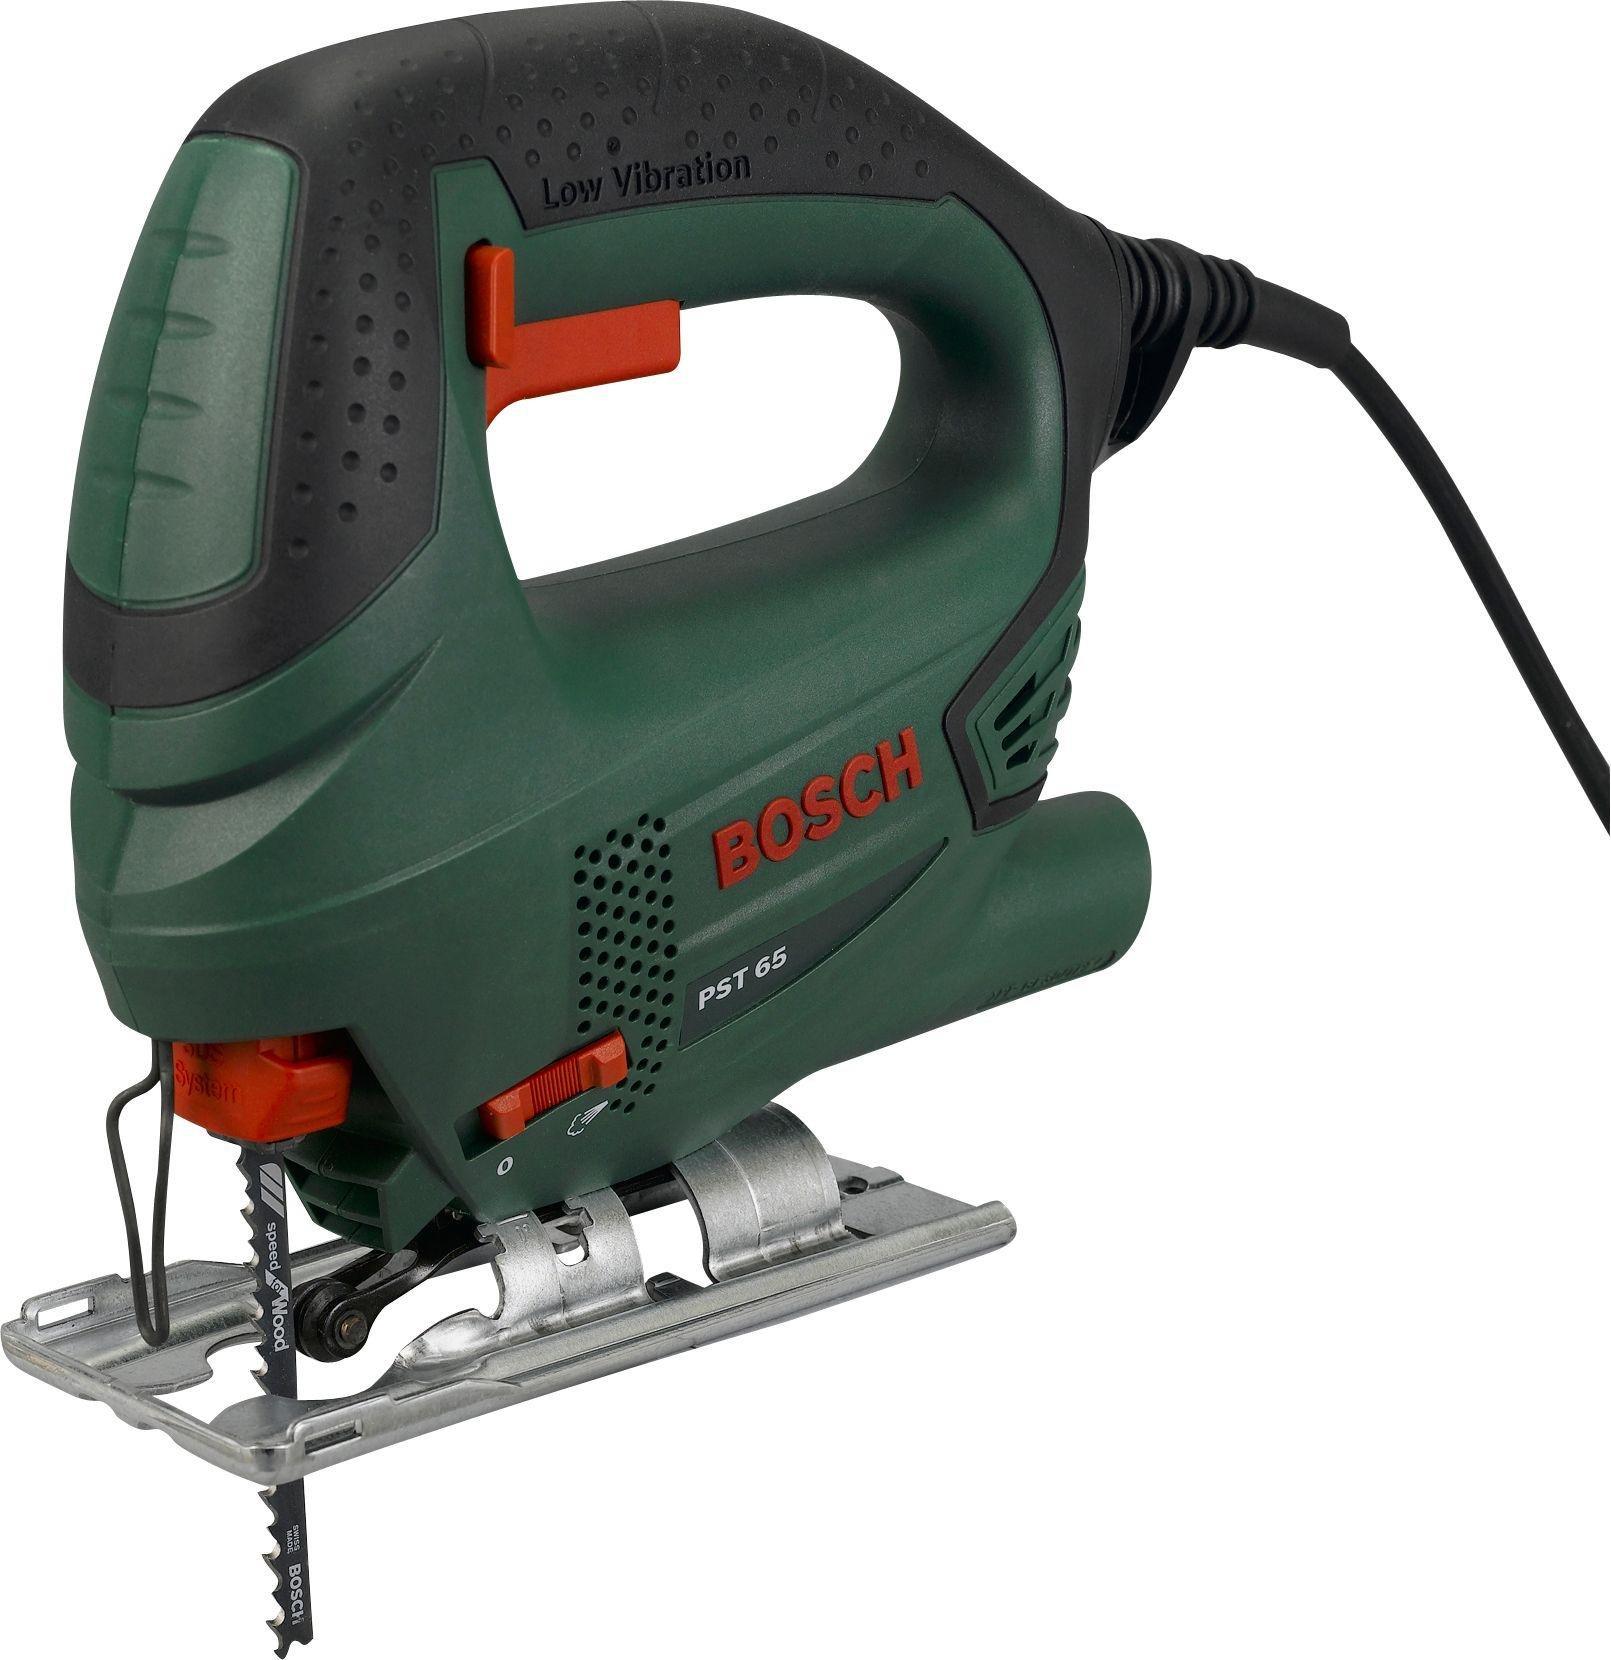 jig saw tool. play video jig saw tool